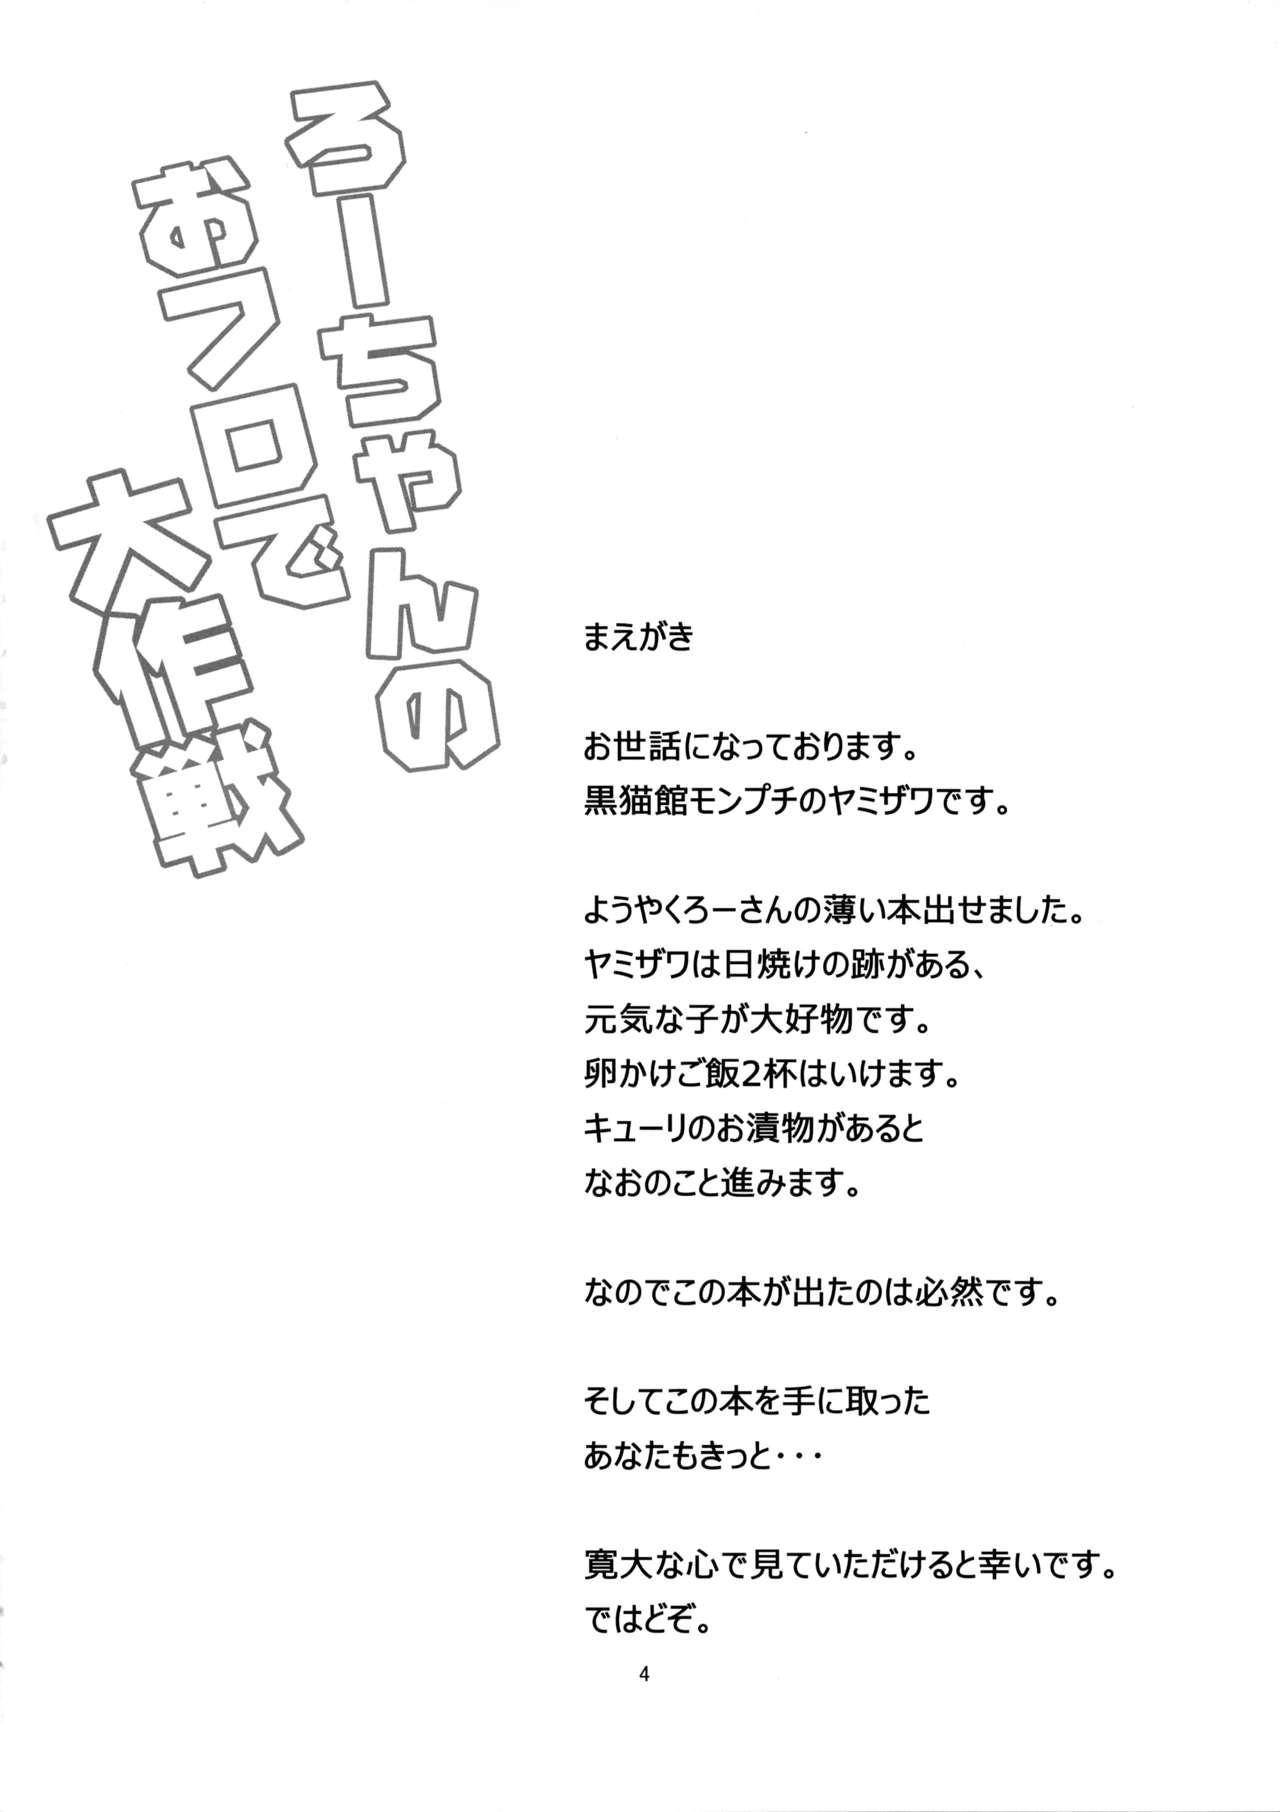 Ro-chan no Ofuro de Daisakusen 2